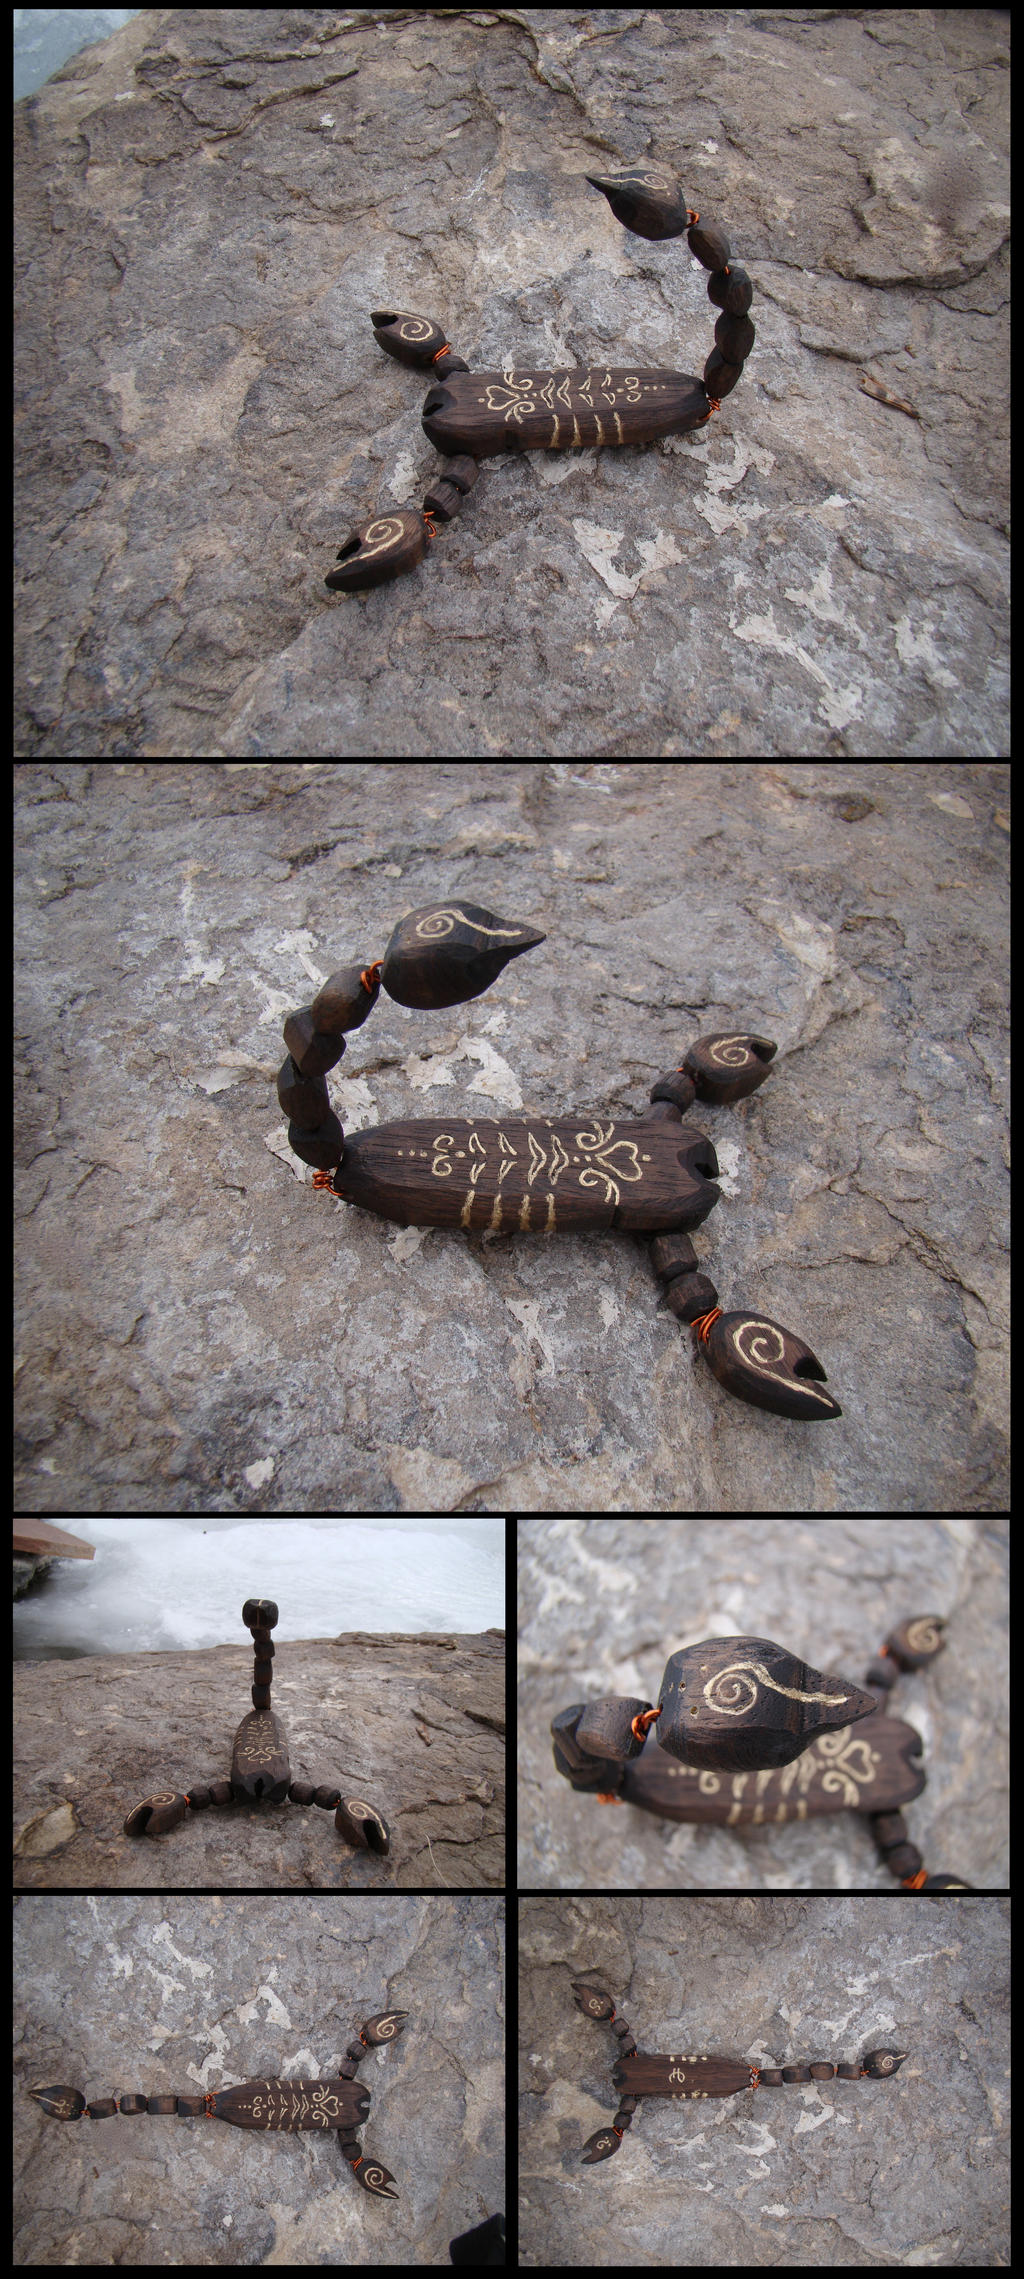 Scorpion Woodwork by xofox